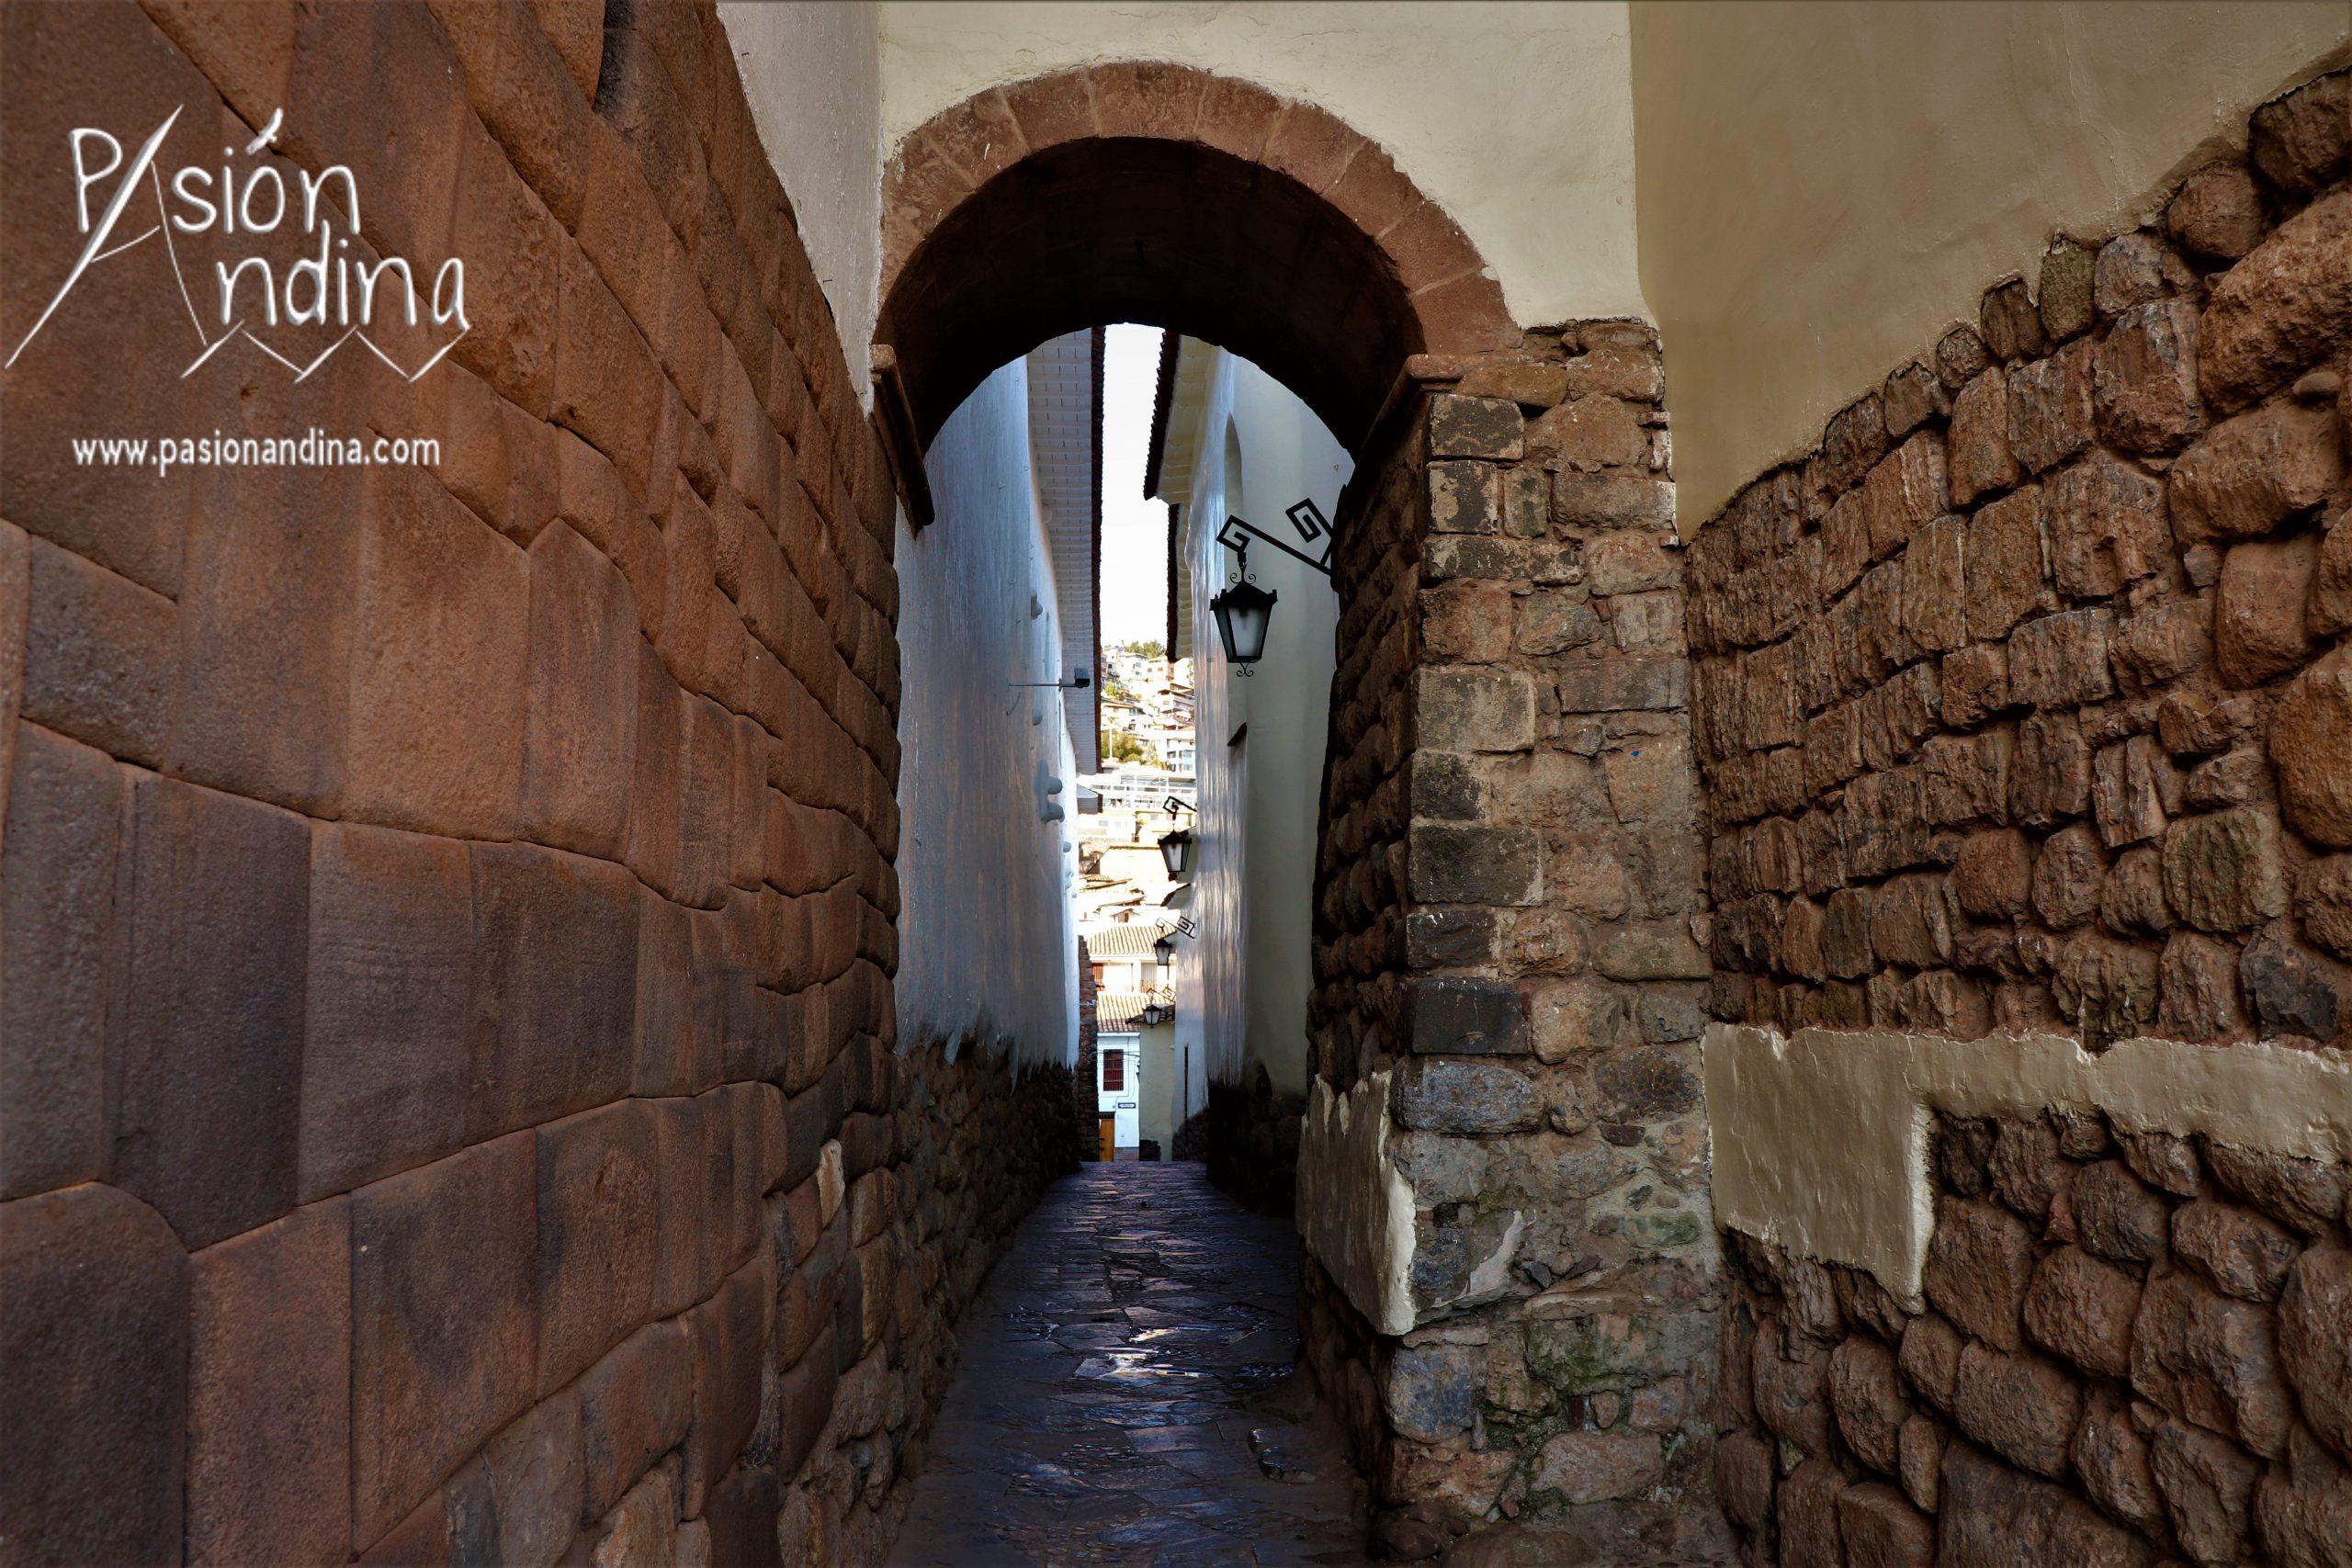 Calle 7 Culebras - Pasion Andina - Cusco